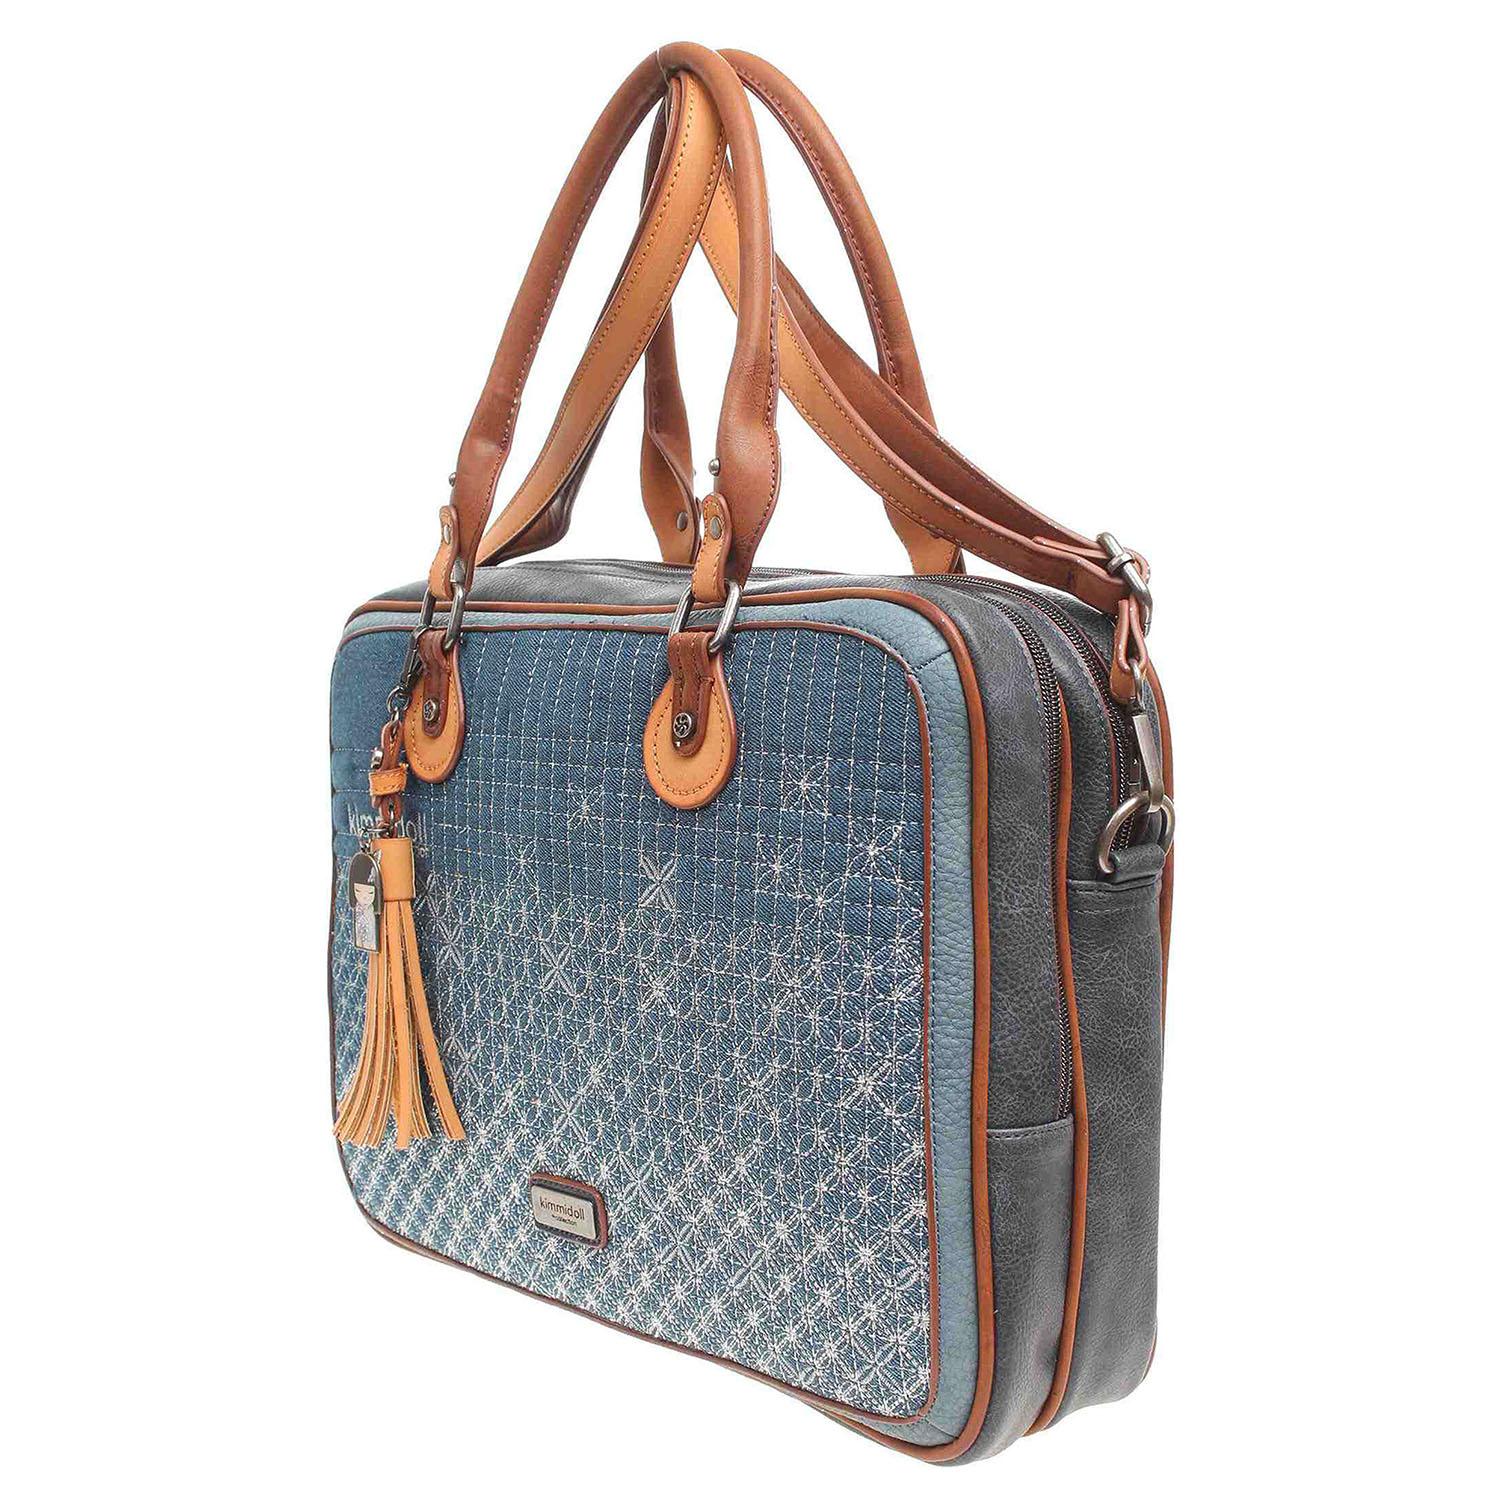 Ecco Kimmidoll dámská kabelka 24605 modrá 11891224